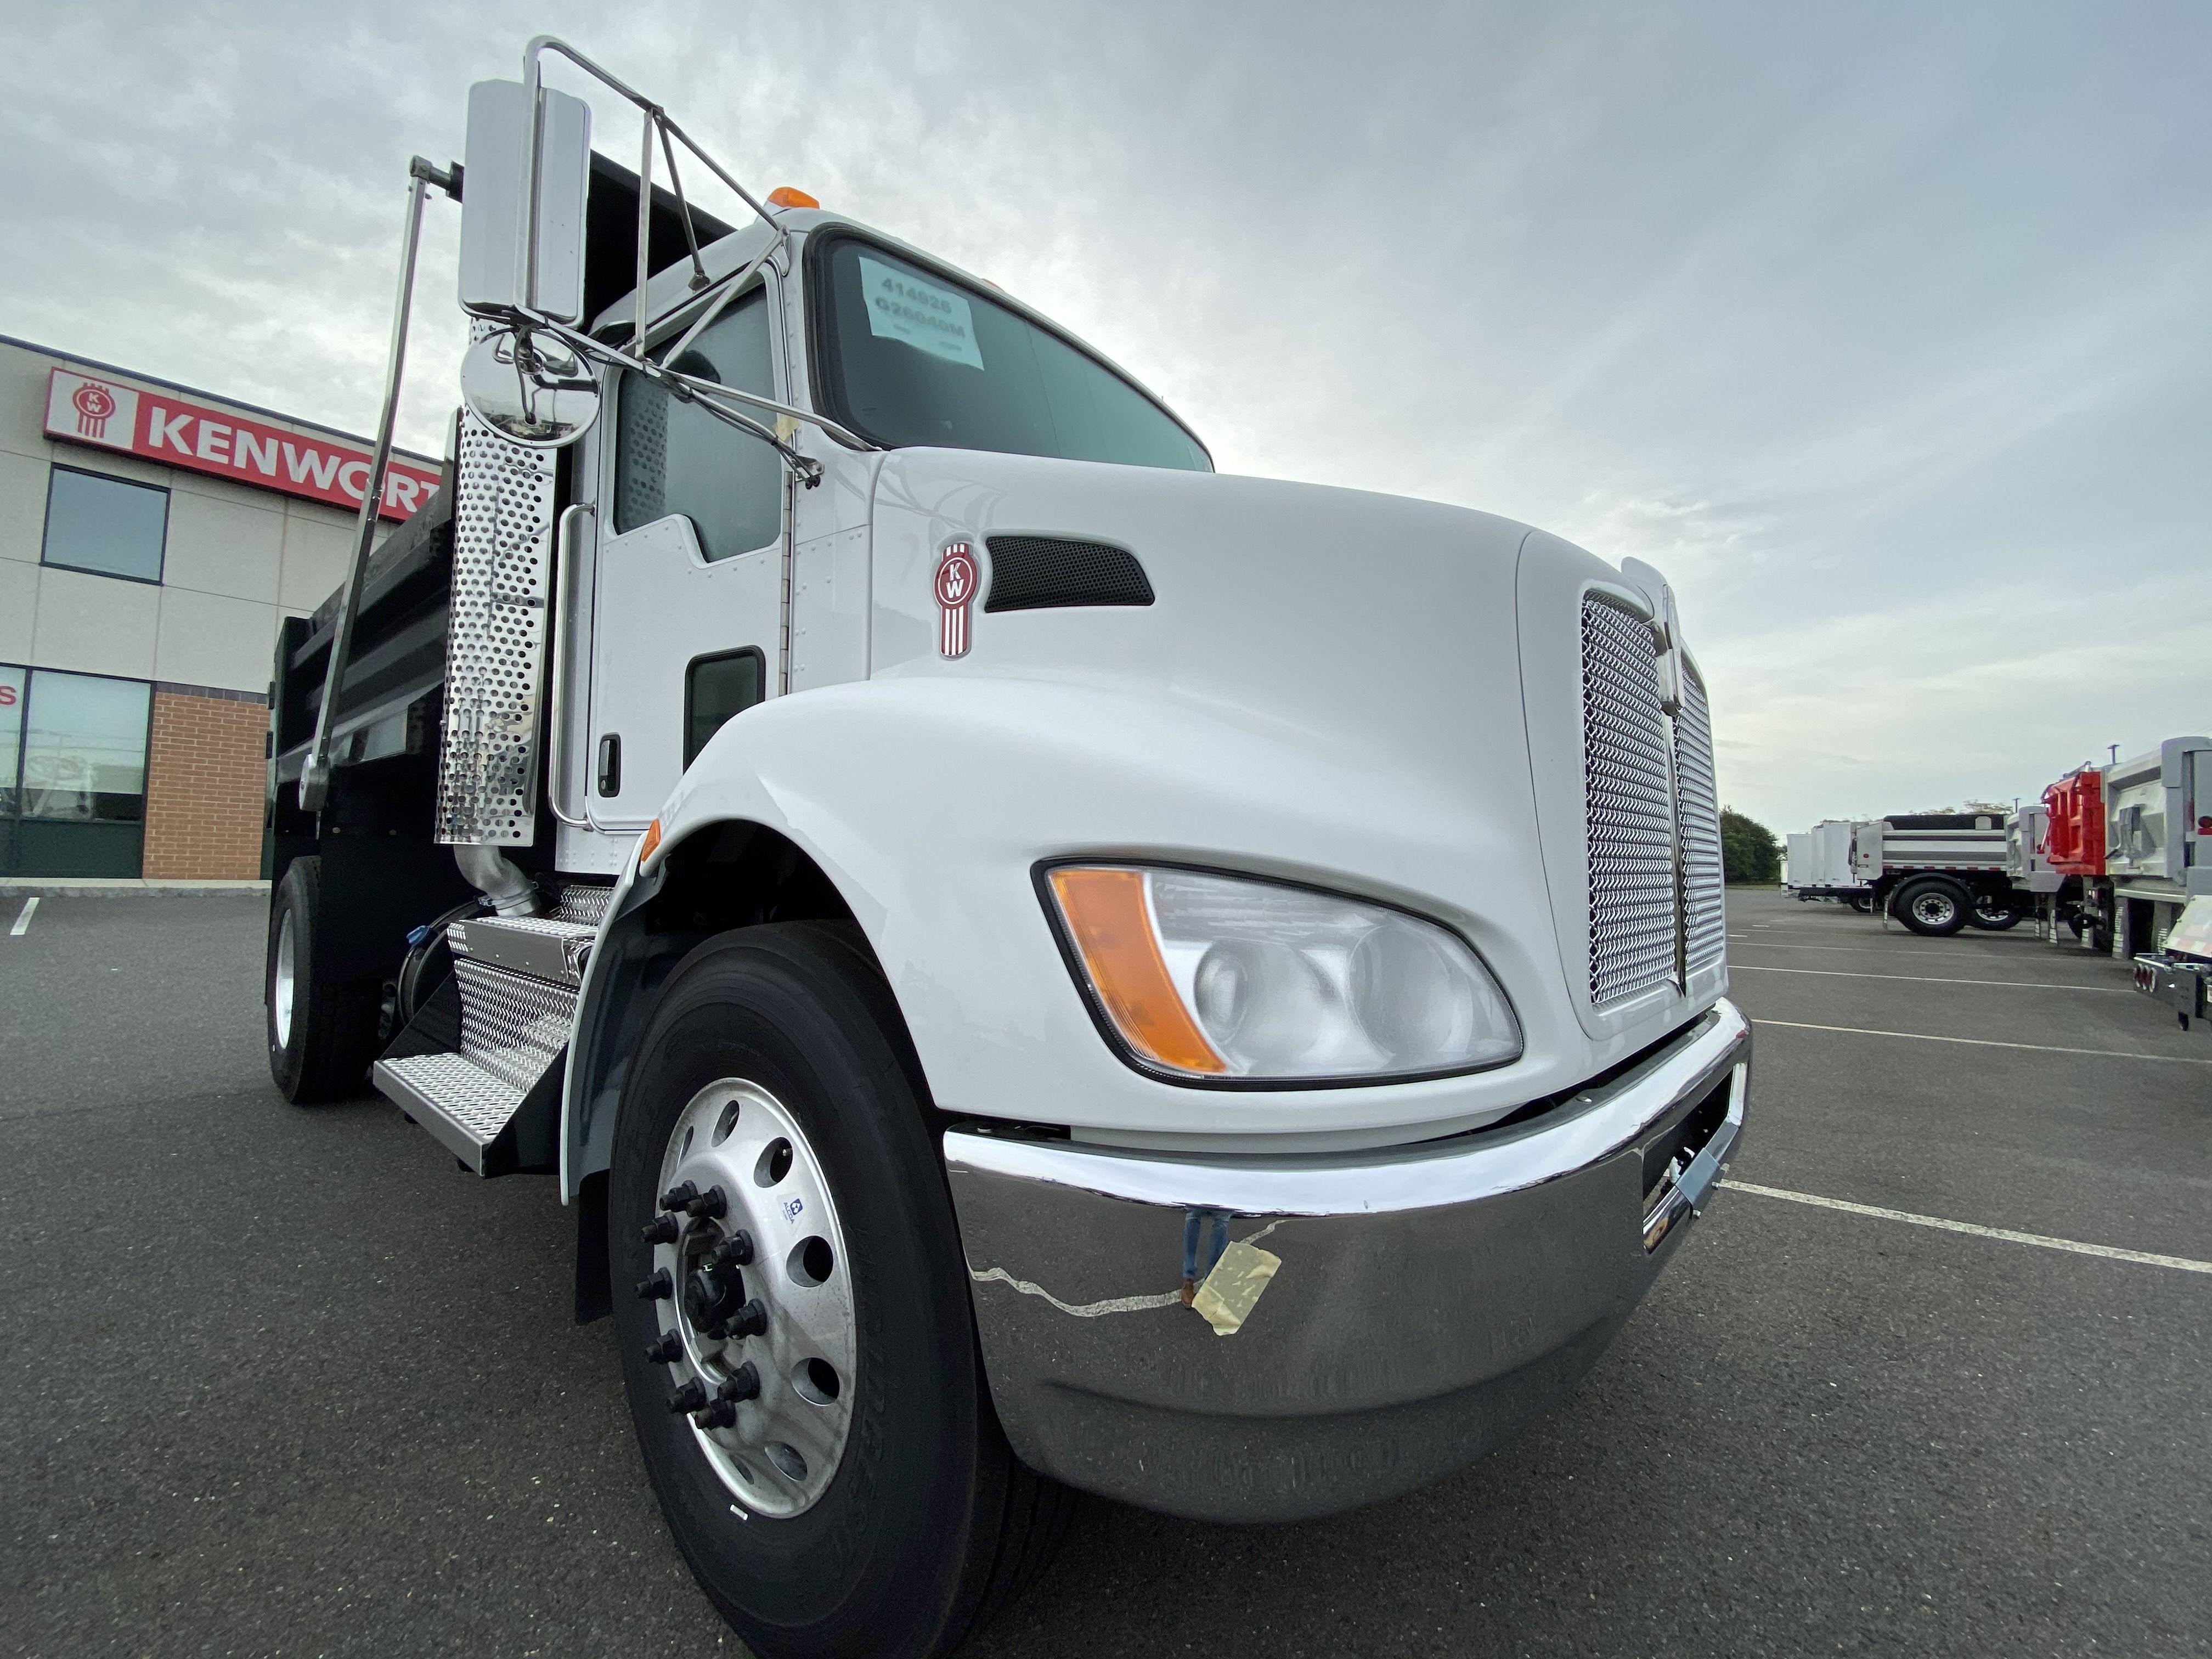 20 Kenworth Trucks Ideas Kenworth Trucks Kenworth Trucks